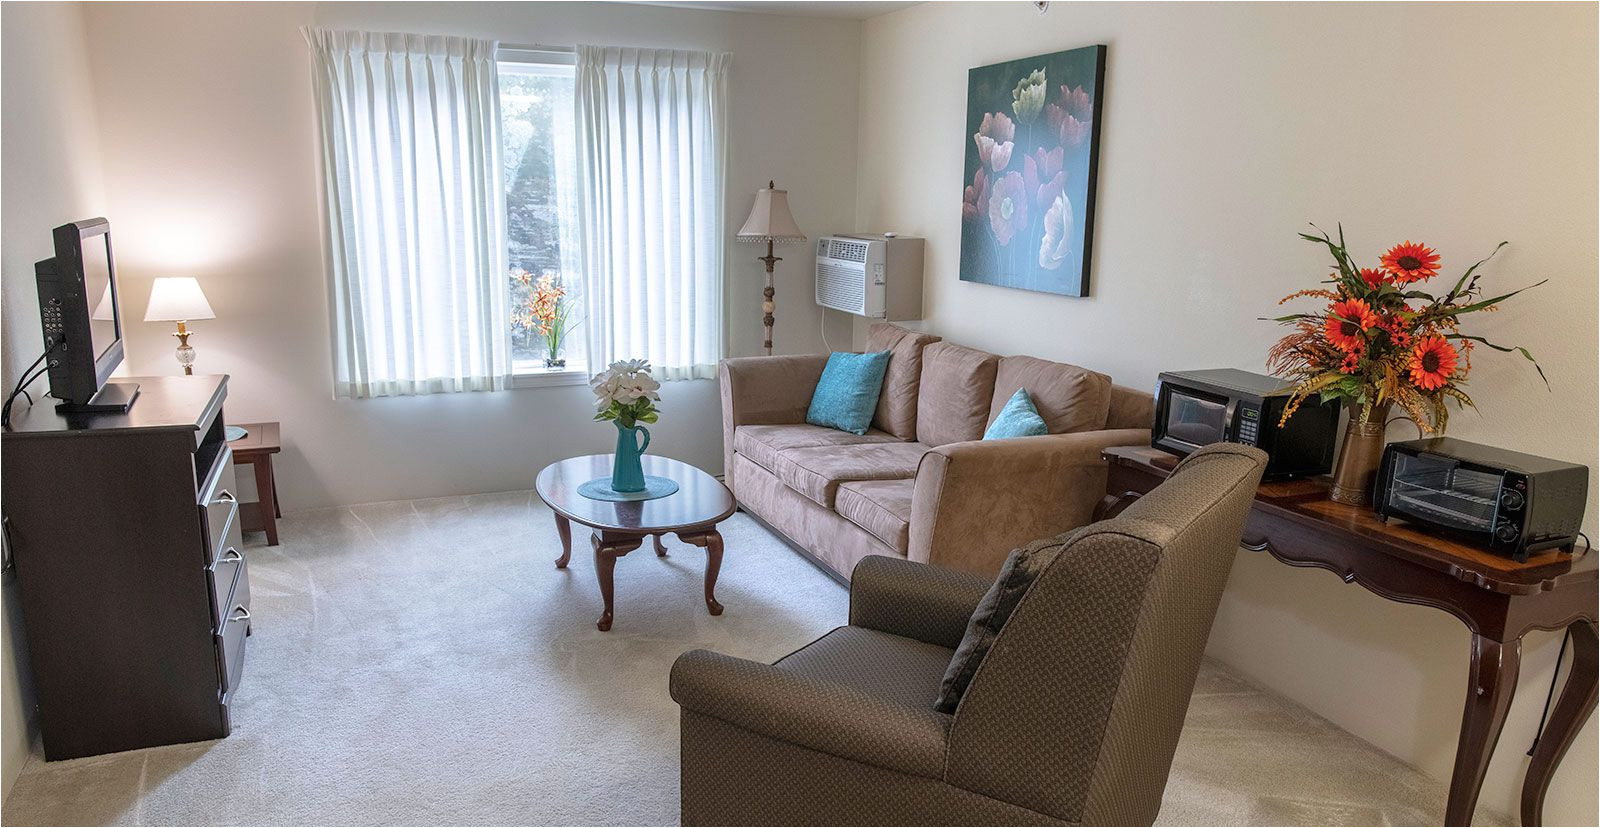 model apartment living room at jordan oaks independent senior living community